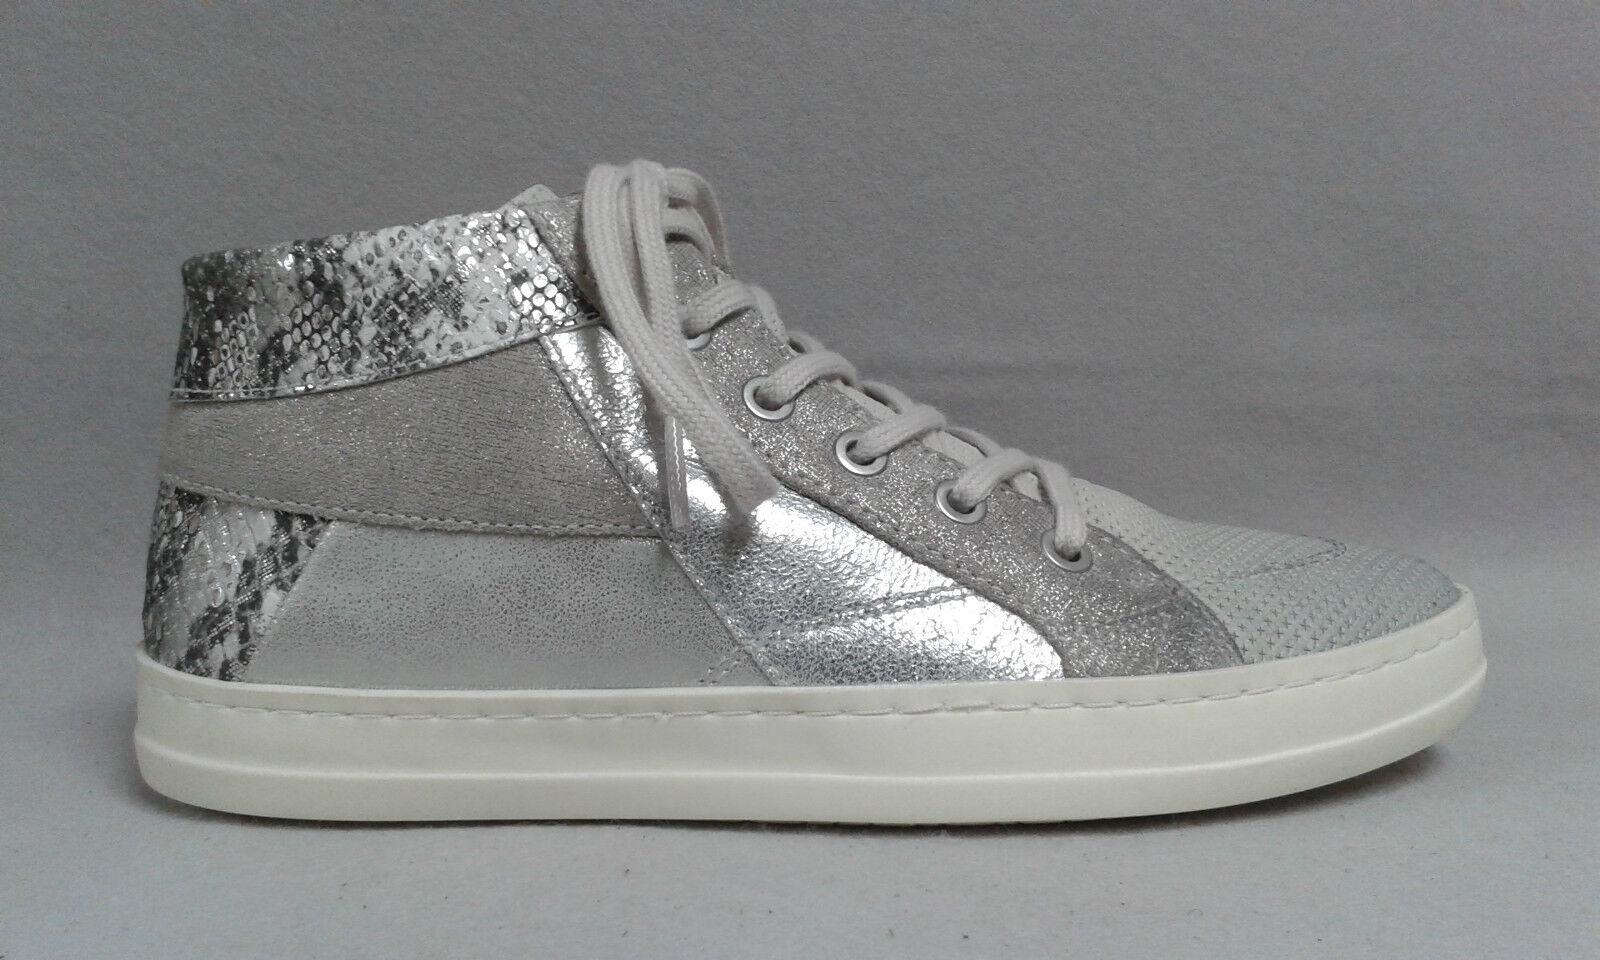 Minu Stiefel Stiefel grau silber Echtleder Reißverschluß beqeuem Lederdecksohle 5